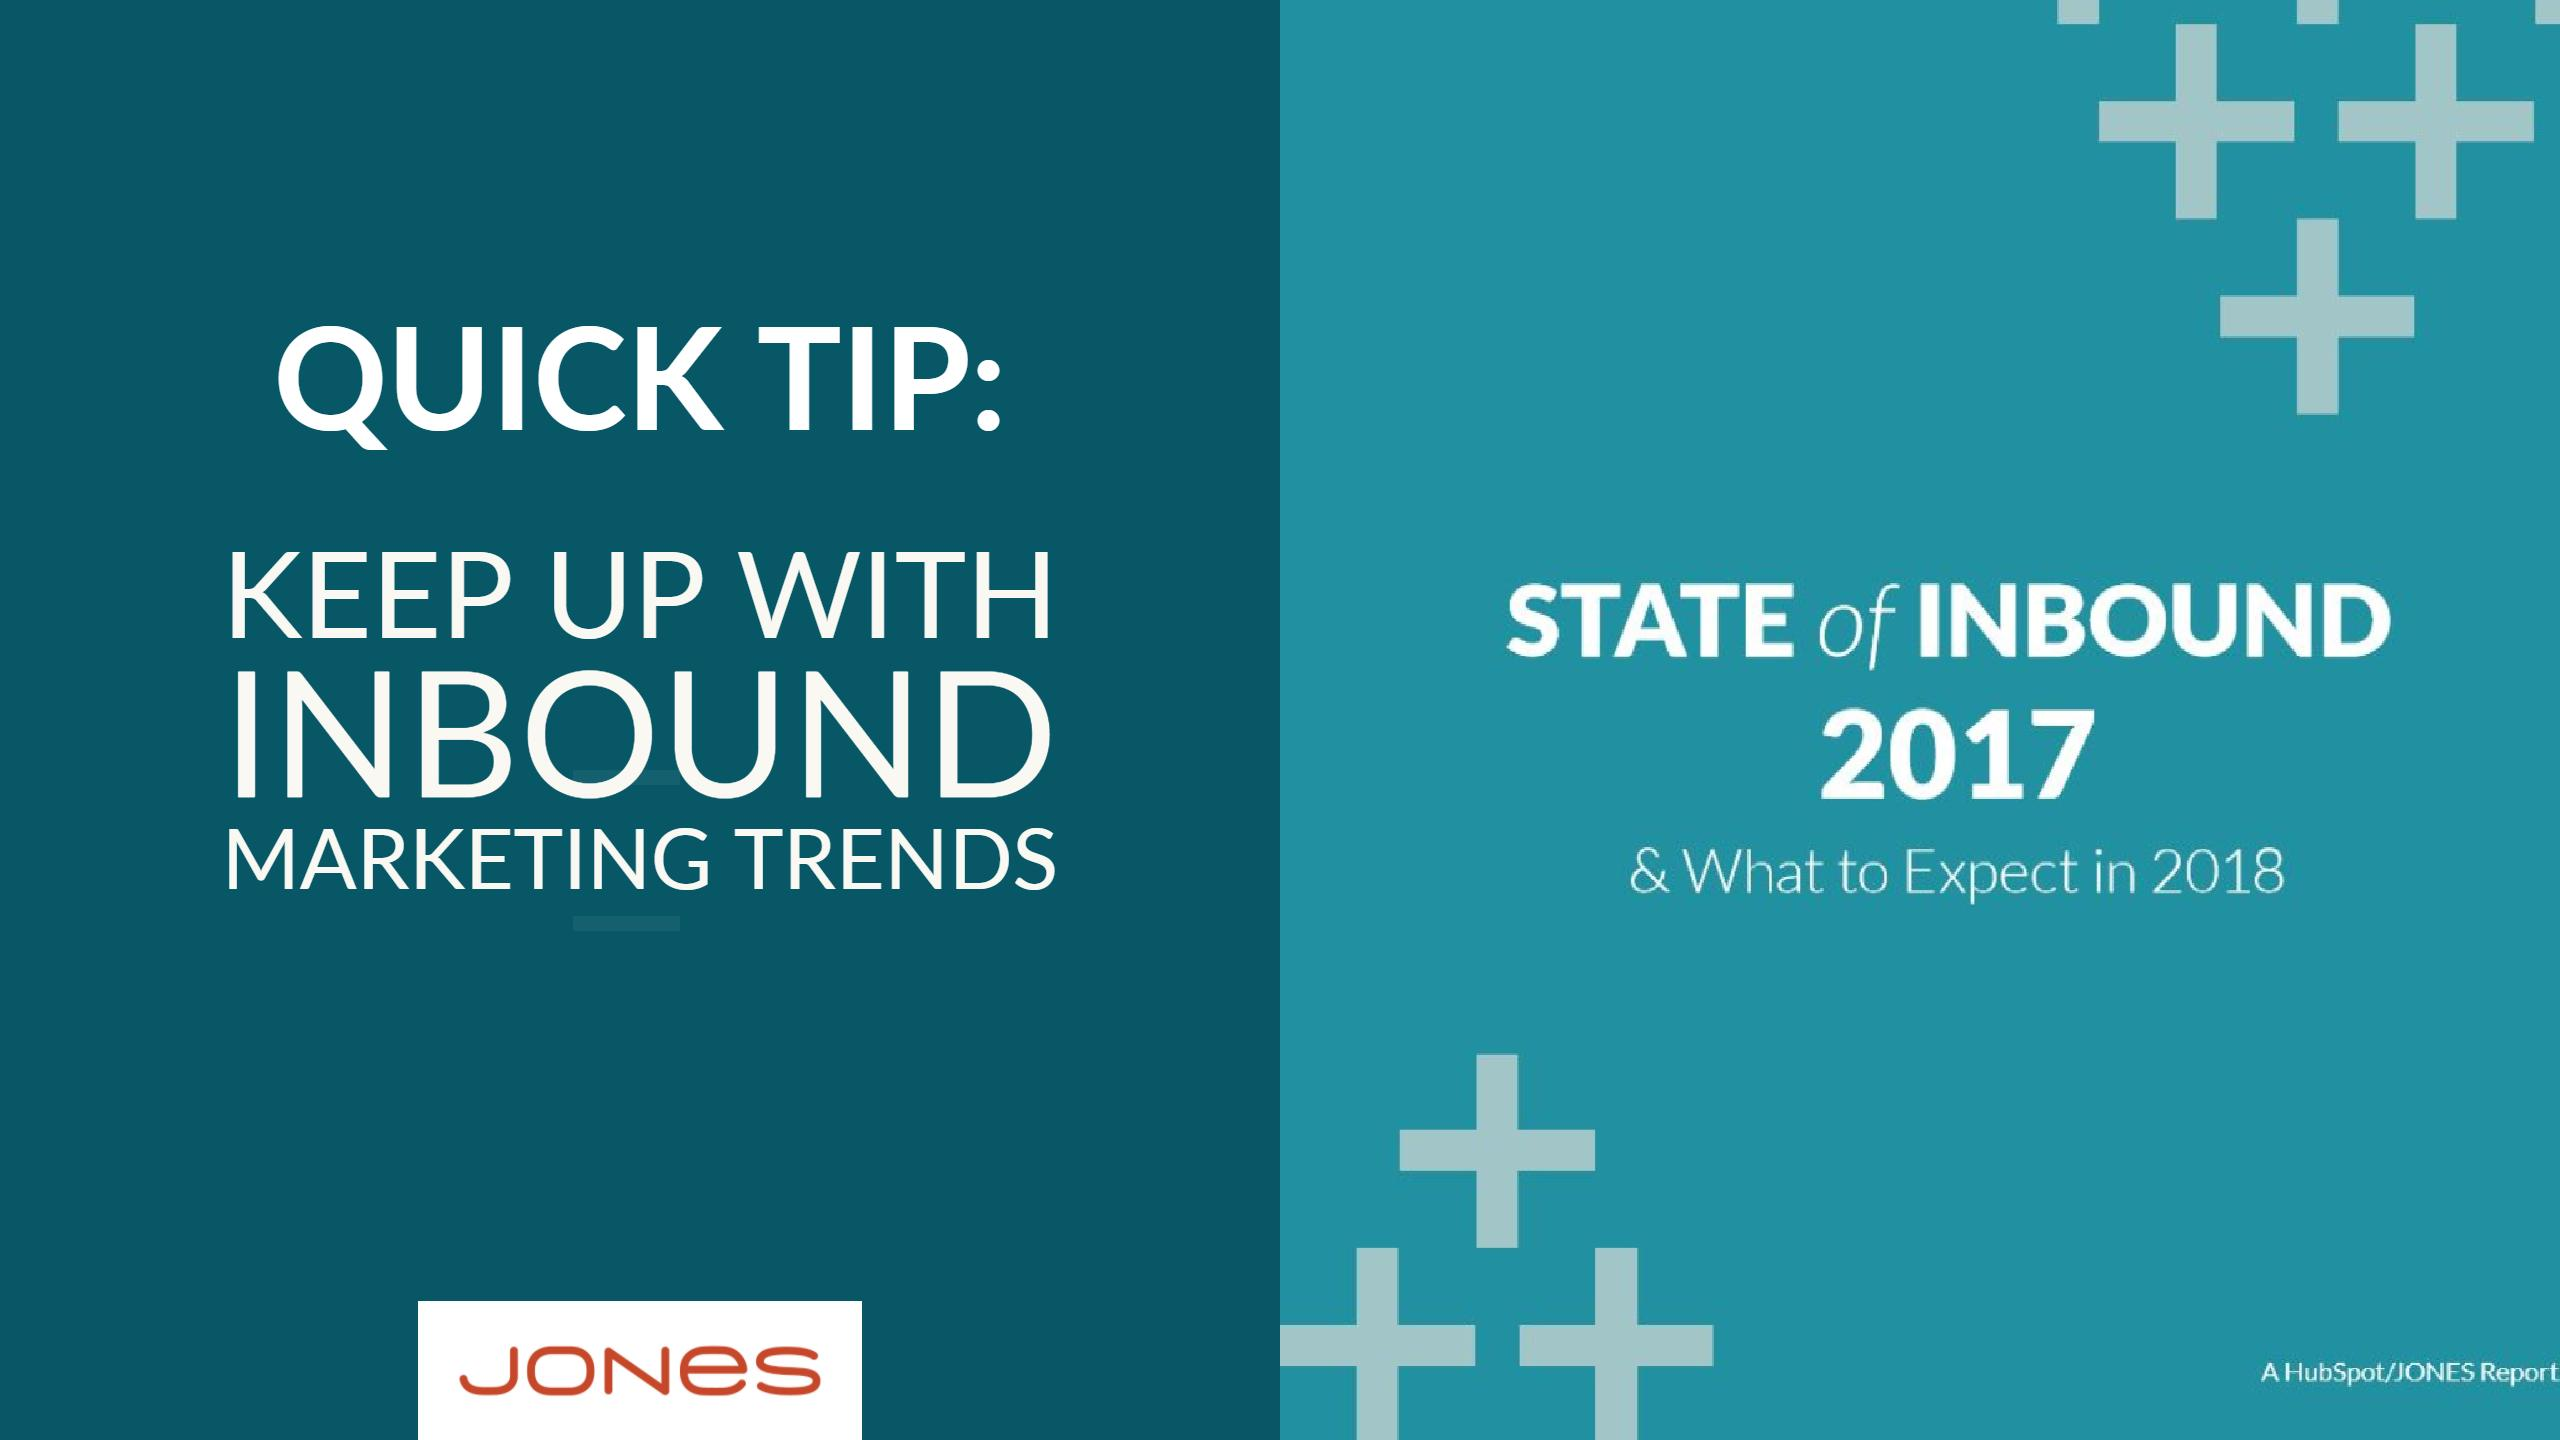 Quick Tip: Keep Up With Inbound Marketing Trends